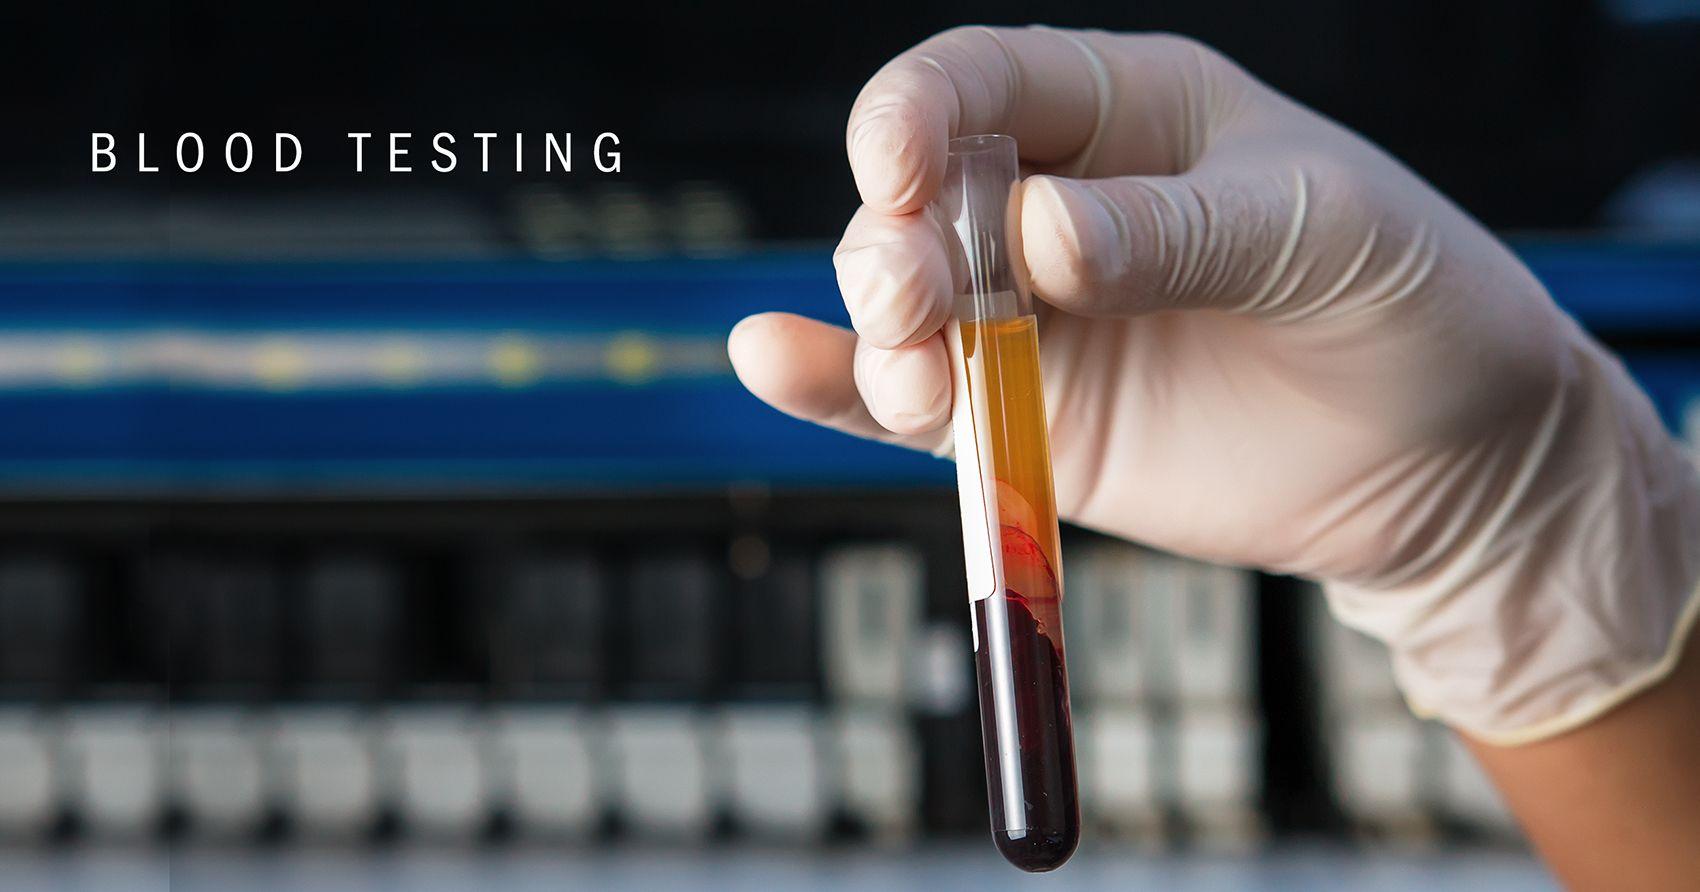 bloodtesting.main.jpg